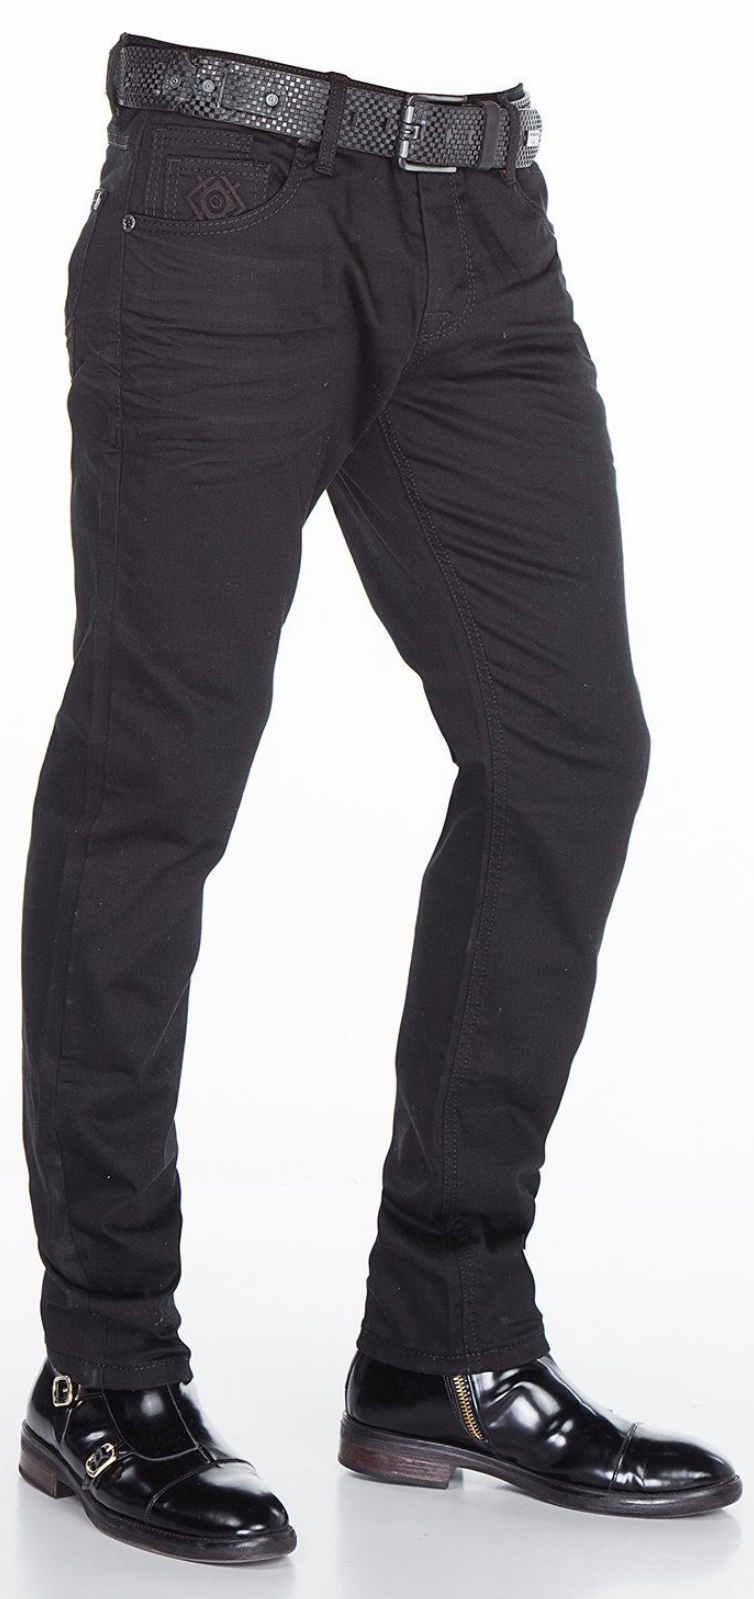 CIPO-amp-BAXX-Herren-Jeans-CD319A-NEU-Hose-Slim-Fit-Enges-Bein-Denim-Stretch